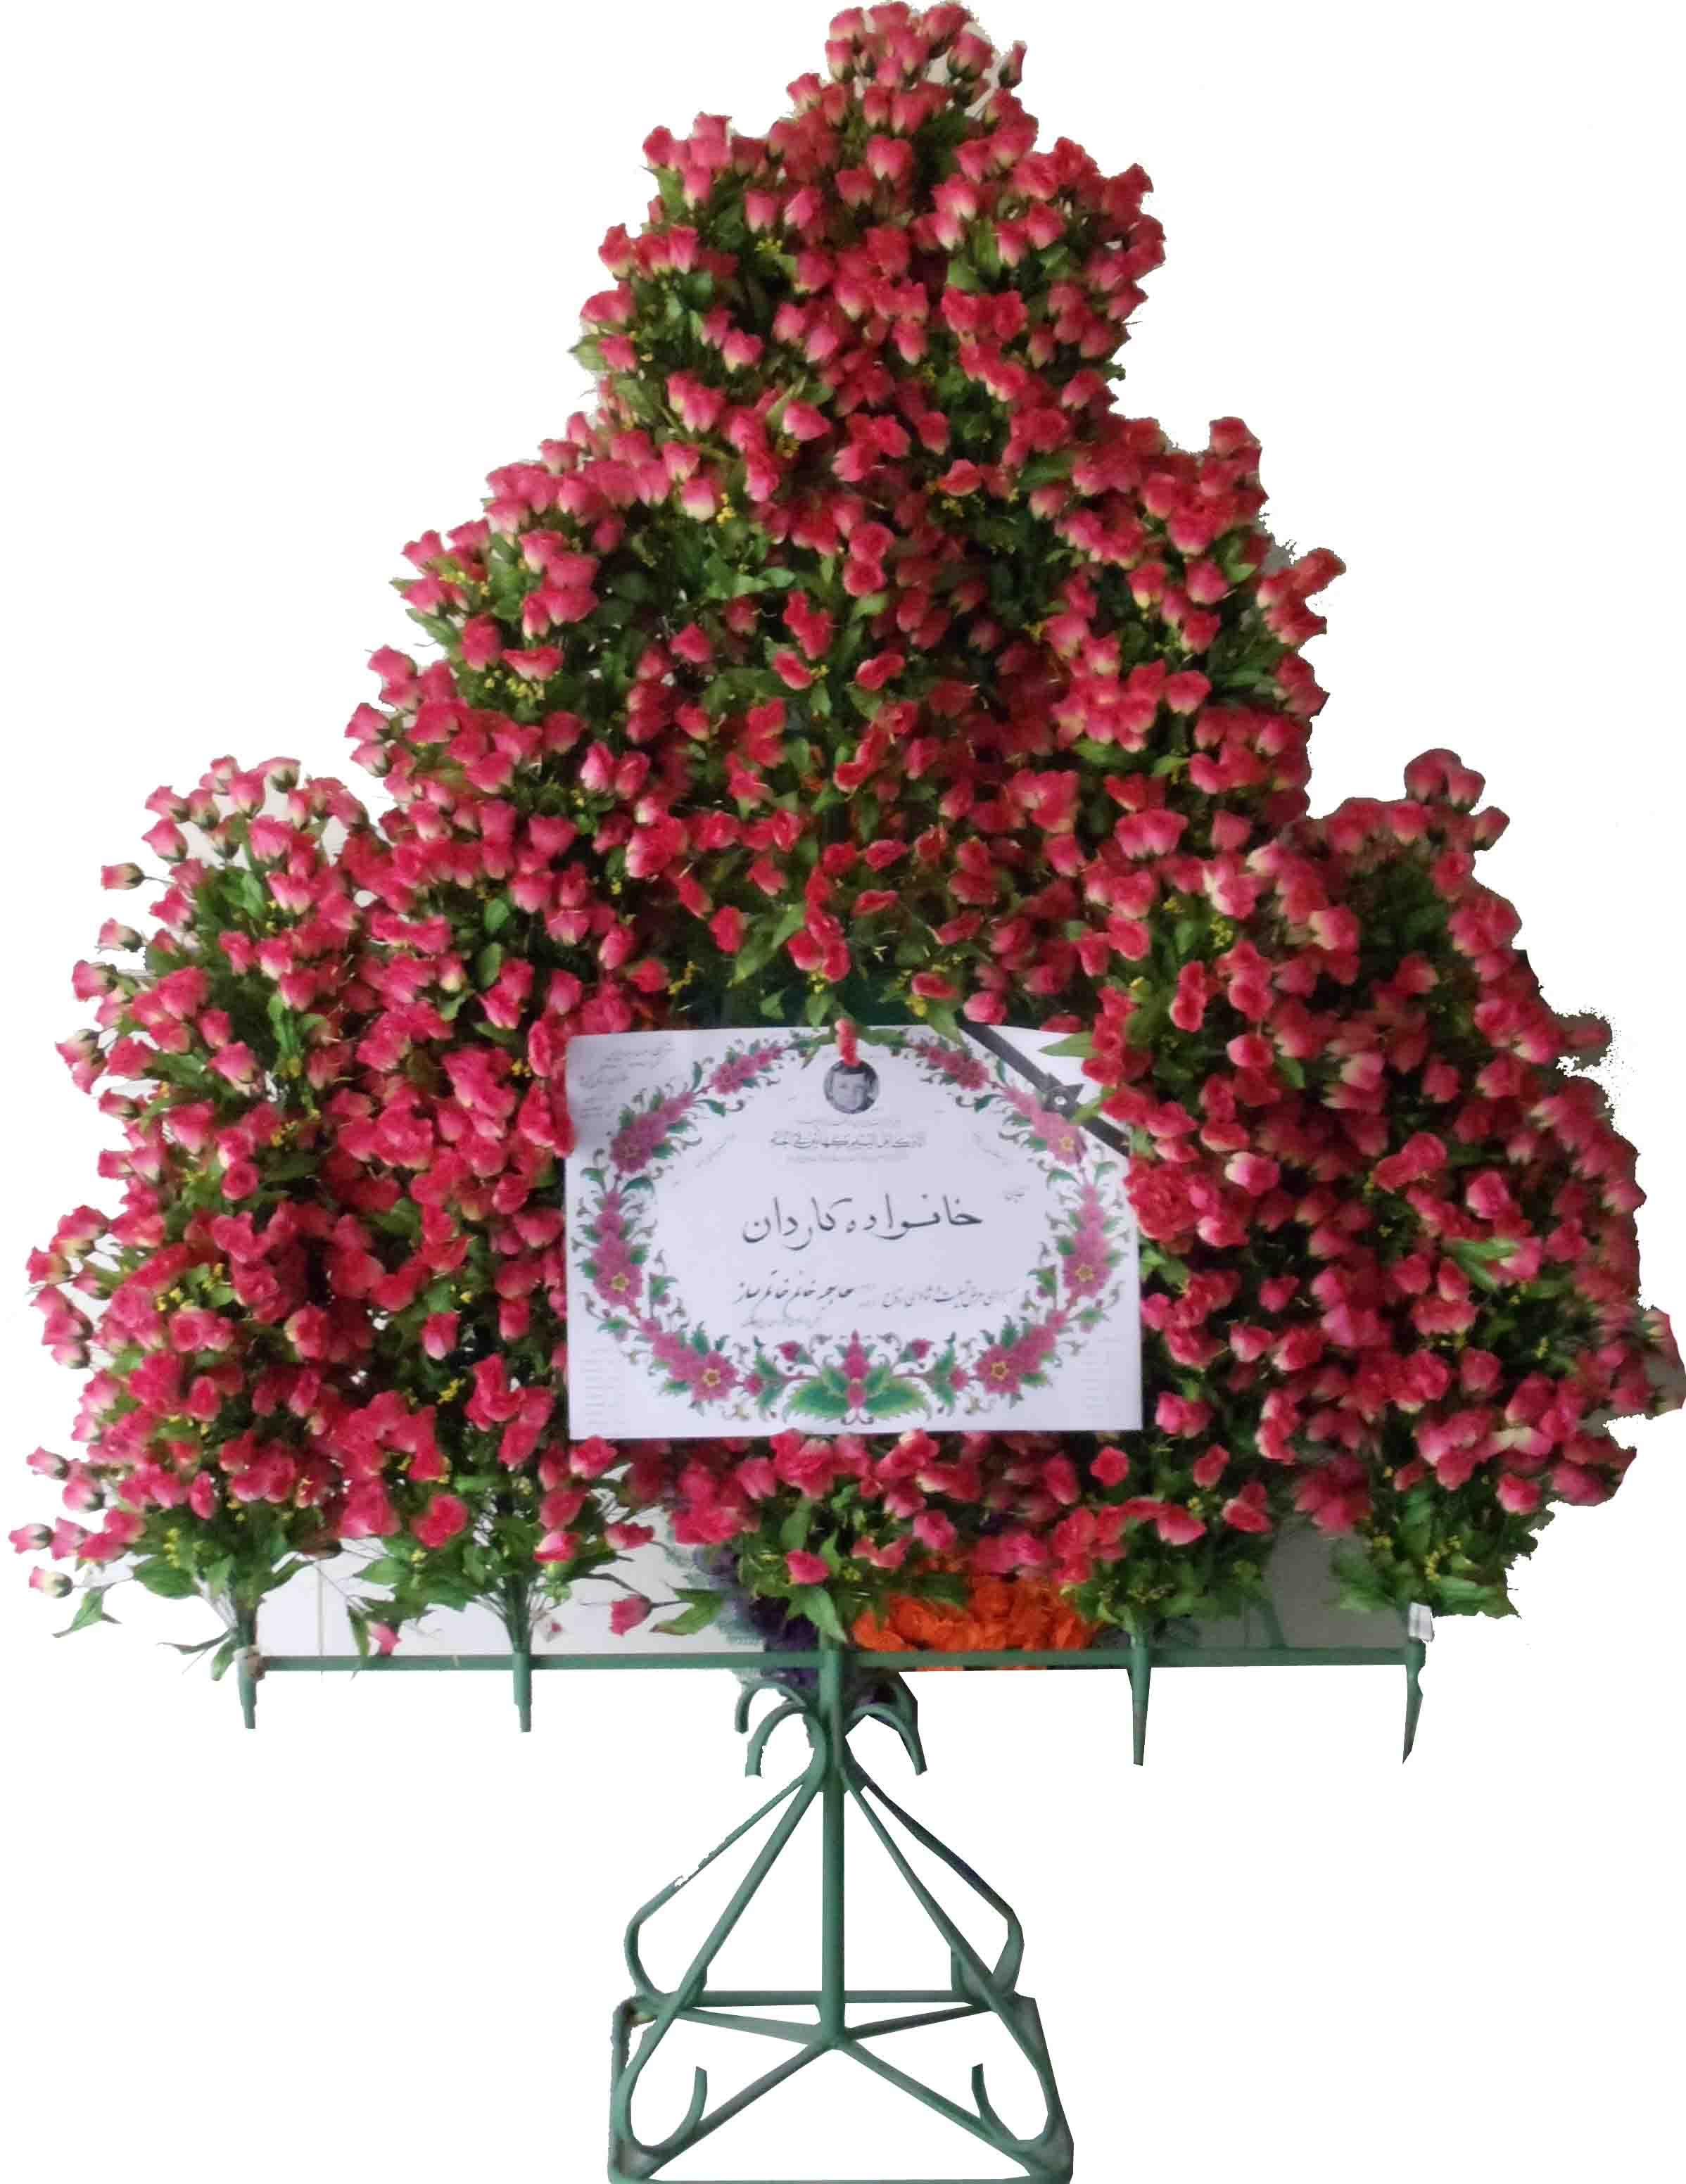 تاج گل خیریه اصفهان